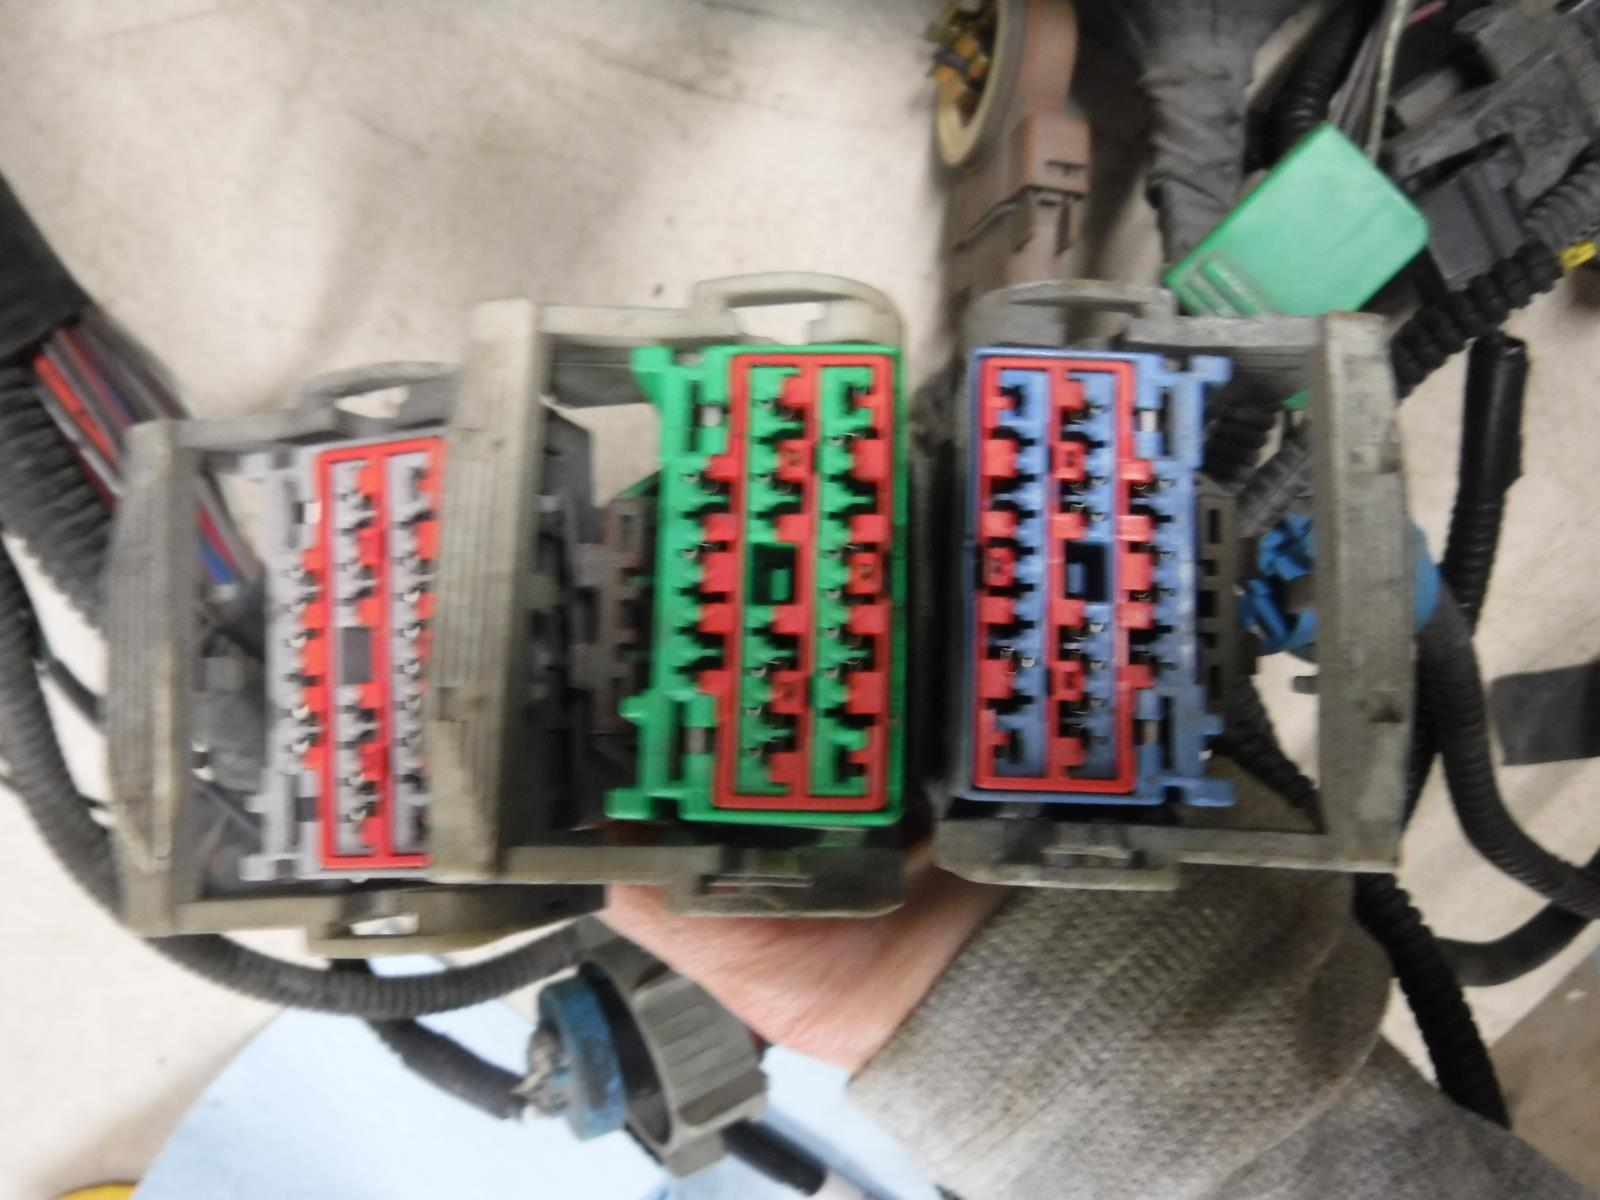 hight resolution of 2004 dodge 1500 5 7 hemi 4x4 engine comp wiring harness p5600099 3af oem